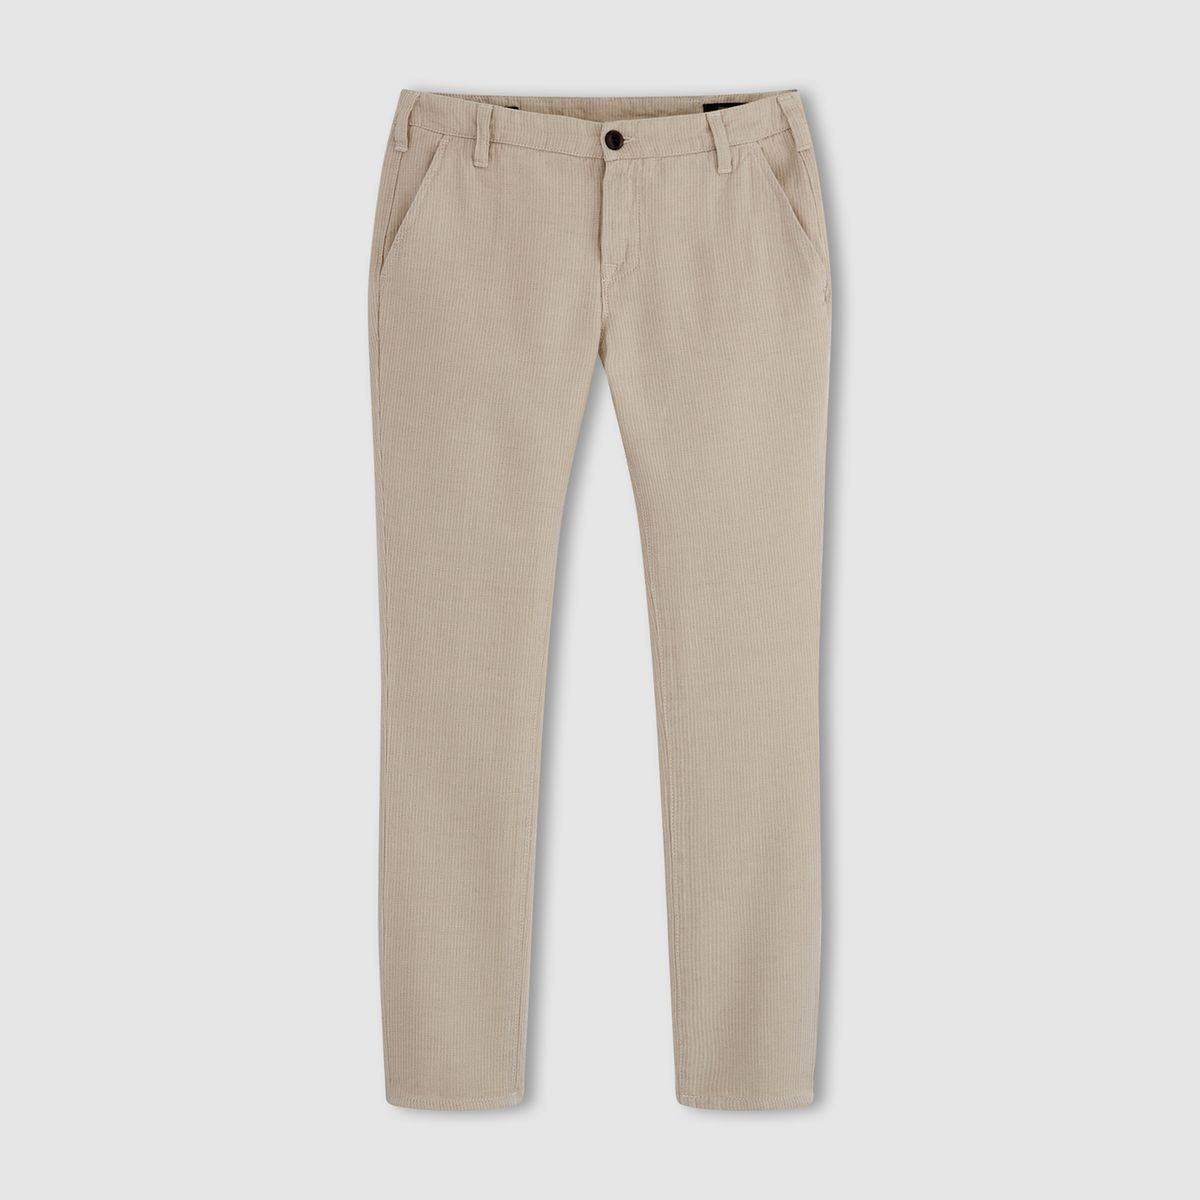 Pantalon CHANEL ARMATURA